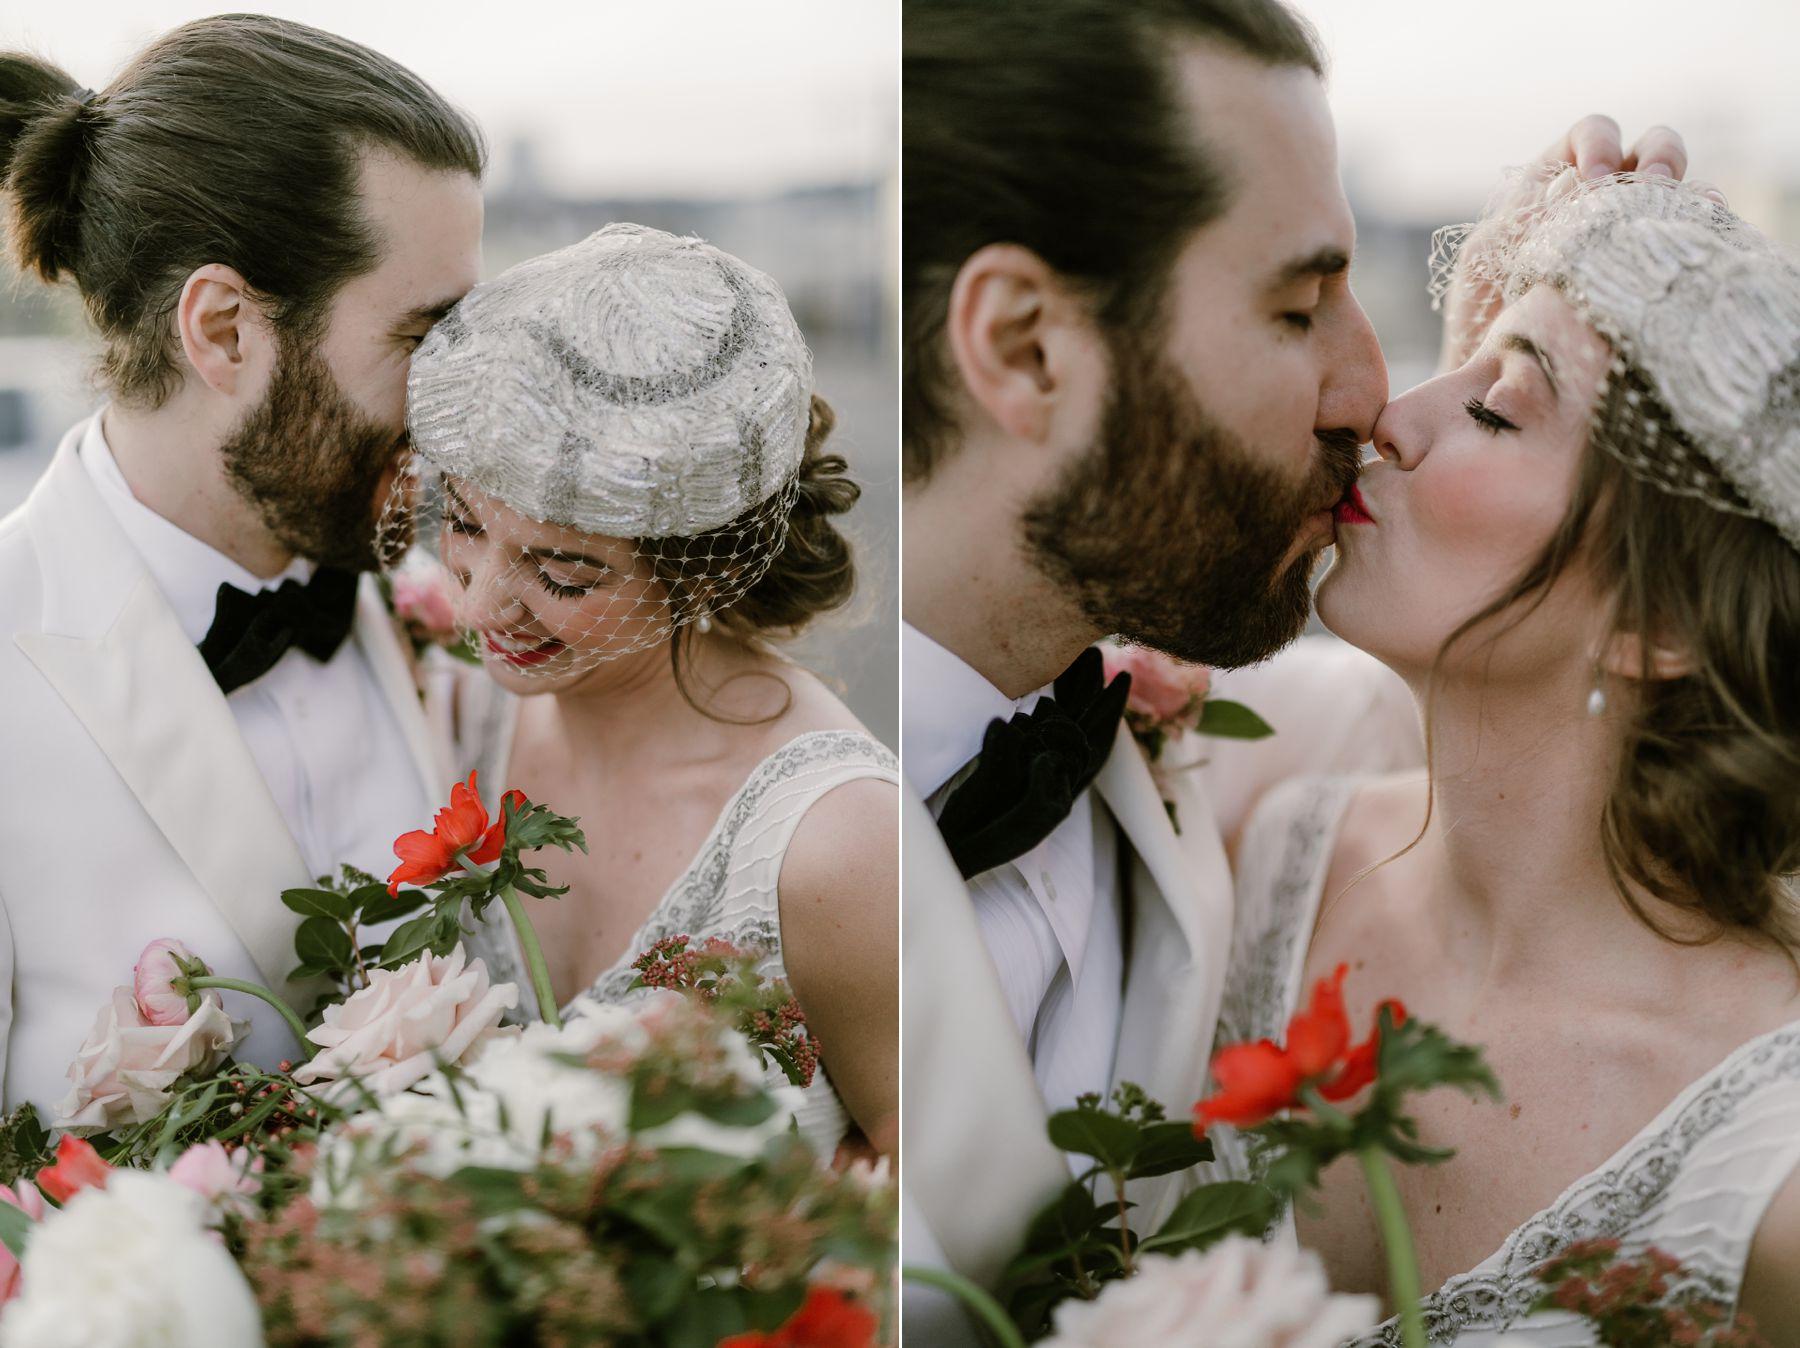 union-pine-wedding_0051.jpg